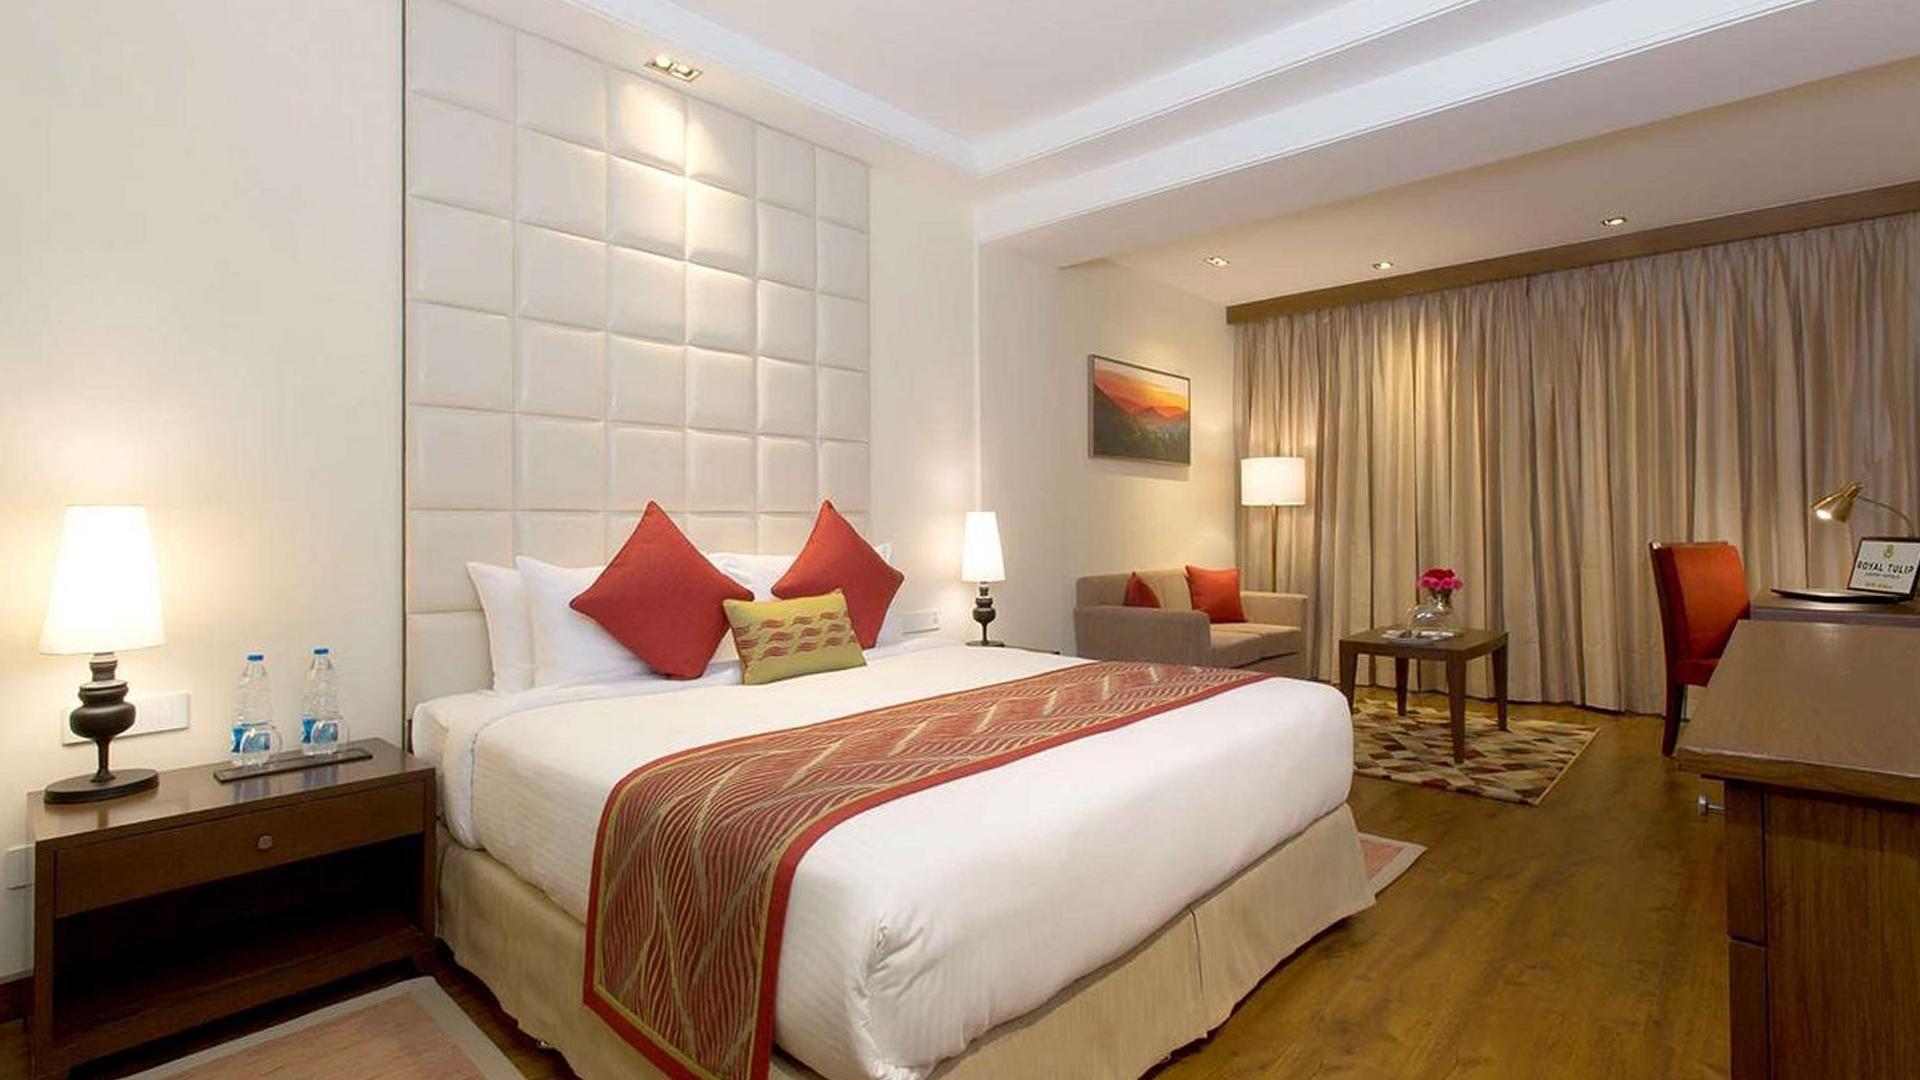 Luxury Room image 1 at Royal Tulip Shimla, Kufri Hills by Shimla, Himachal Pradesh, India